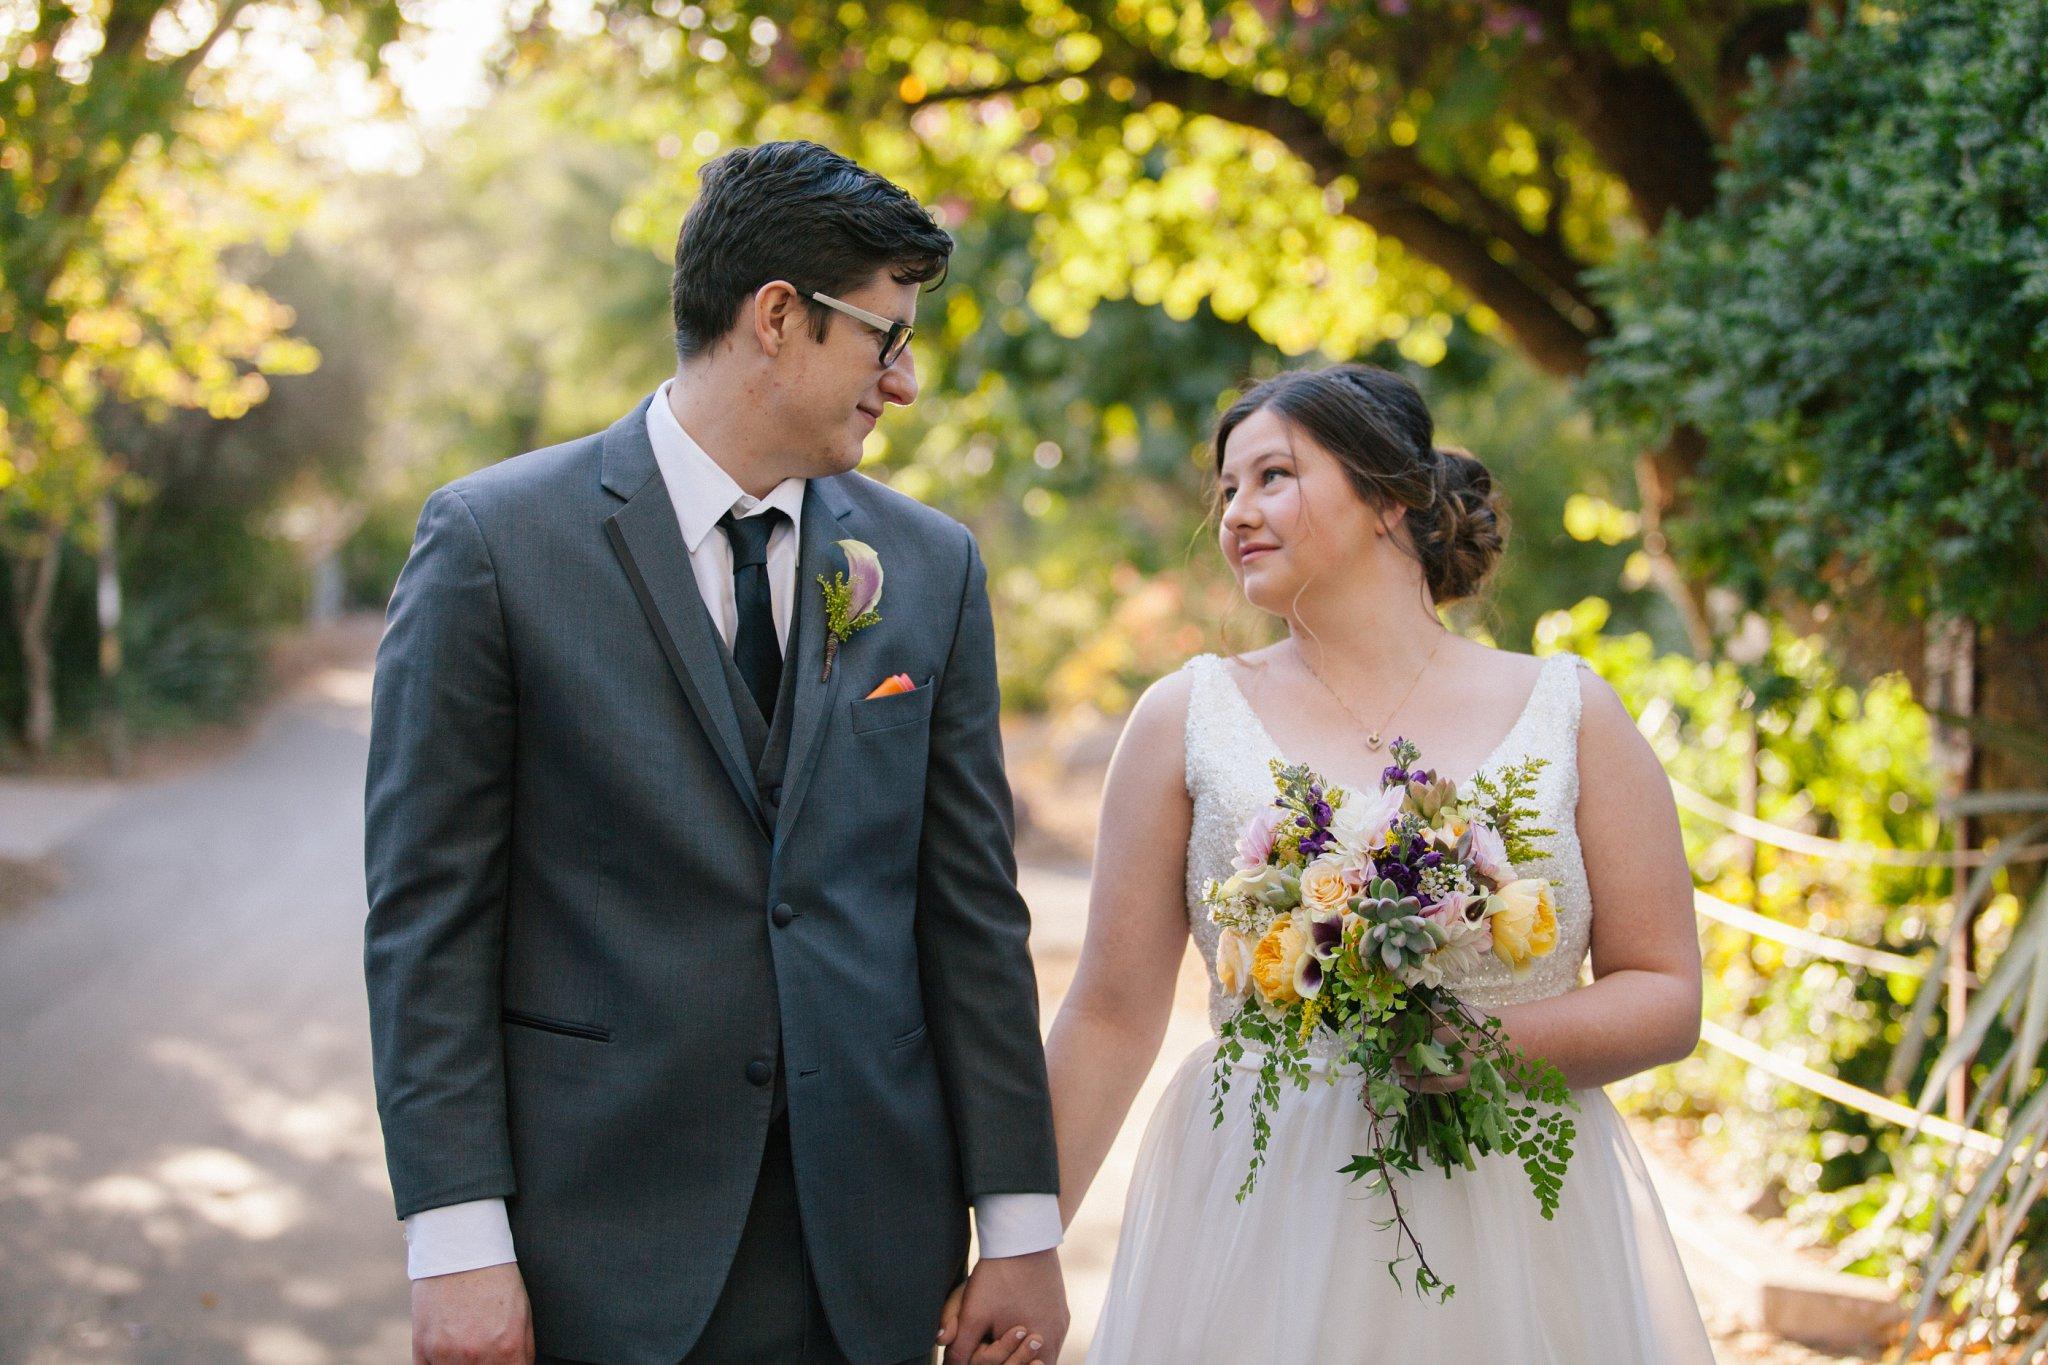 bride & groom at Phoenix Zoo wedding by Phoenix Zoo wedding photographer Alyssa Campbell